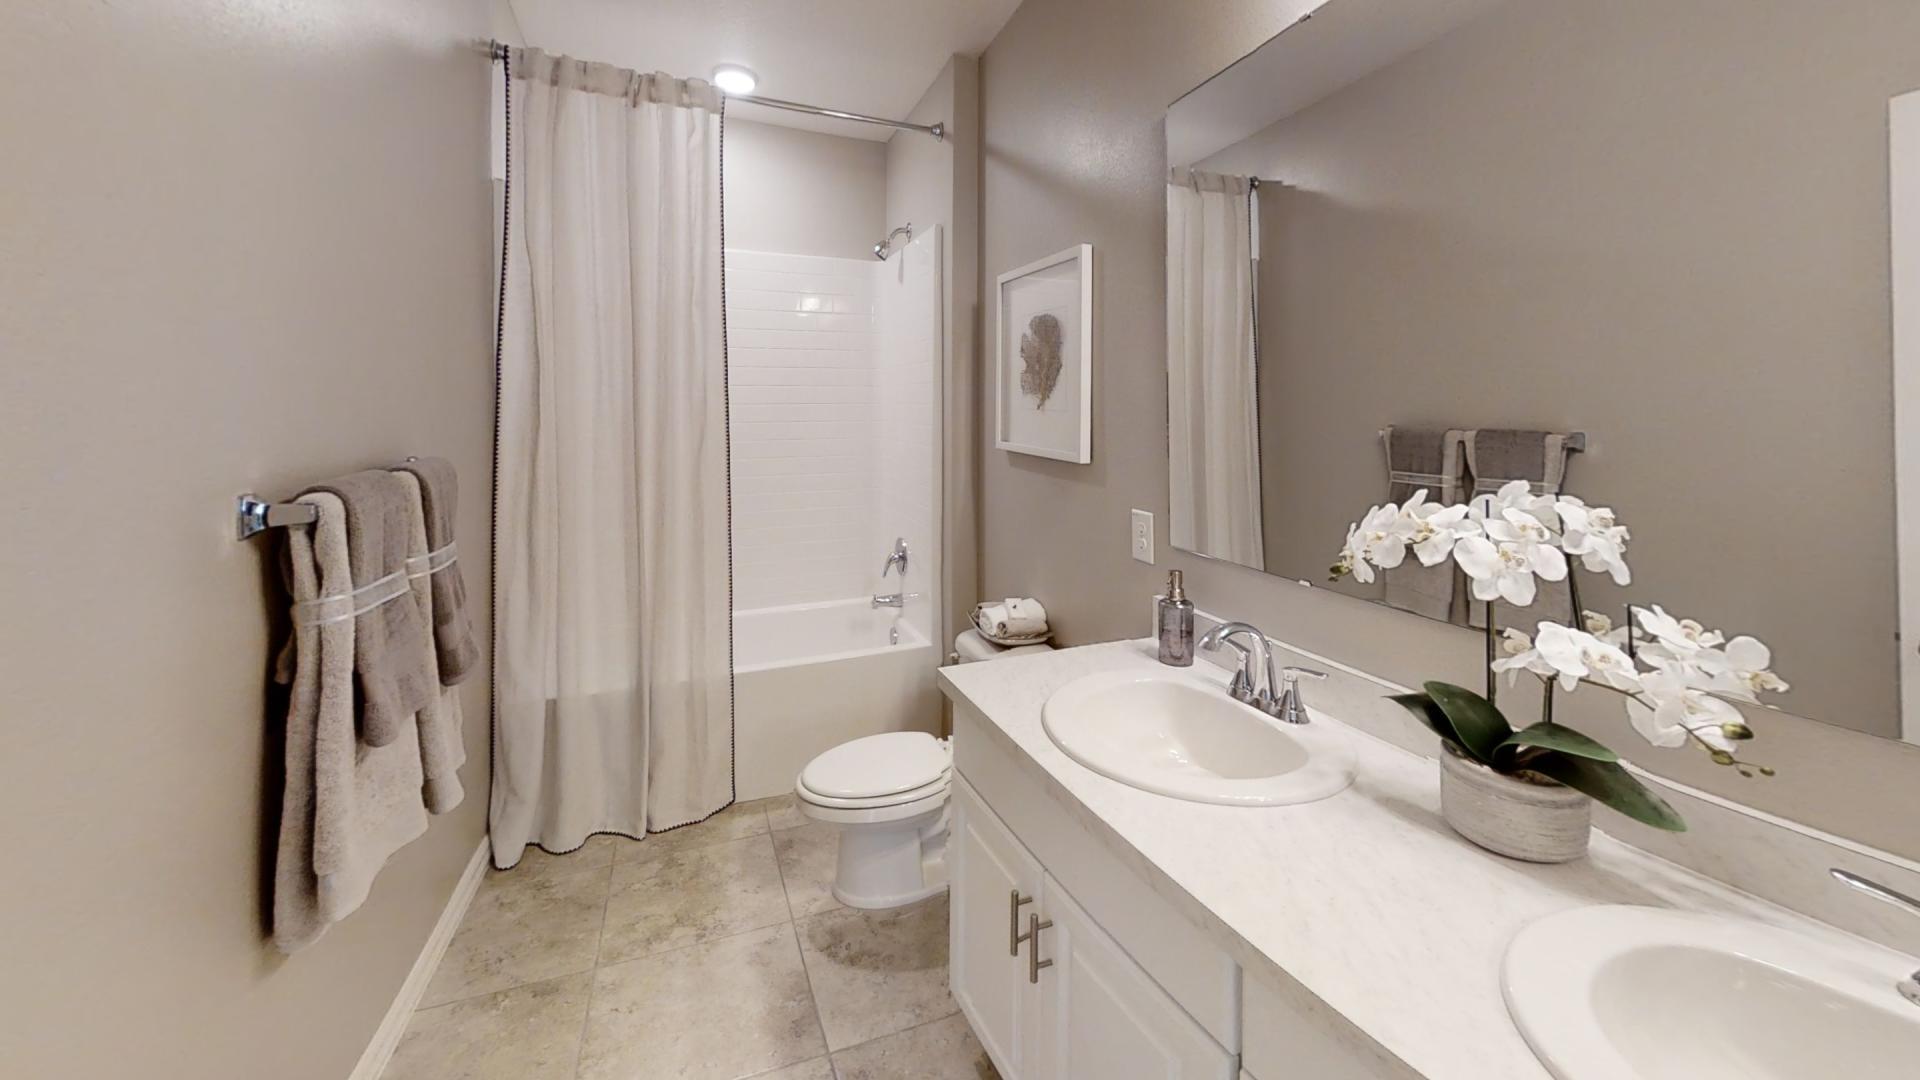 Bathroom featured in the Mesquite By Maronda Homes in Punta Gorda, FL